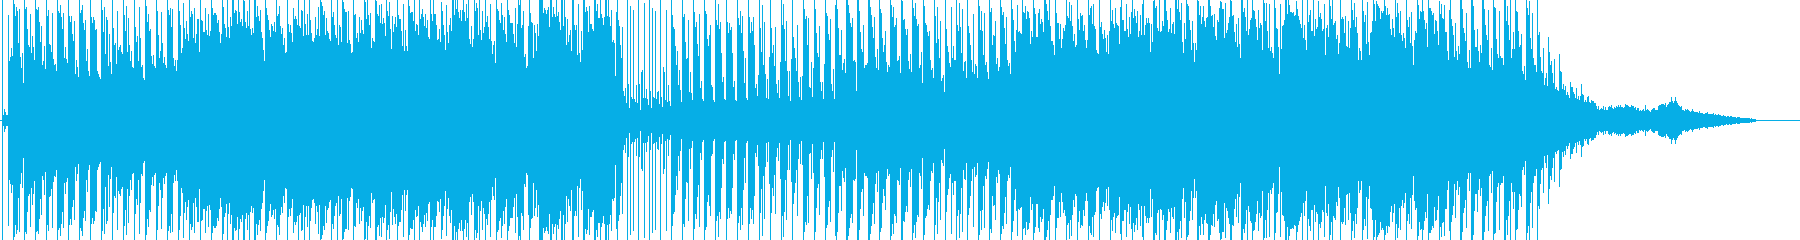 anの再生済みの波形